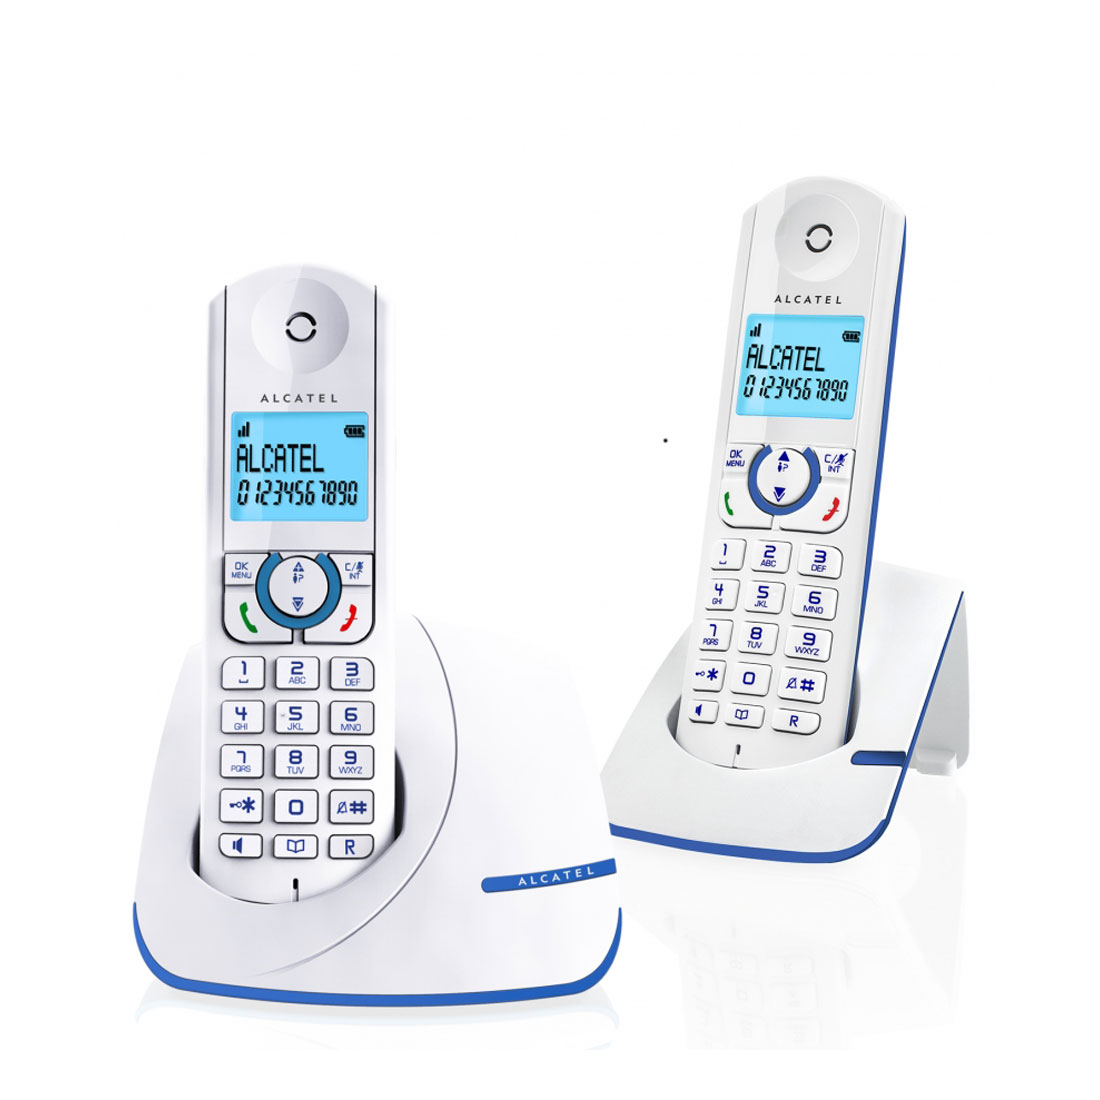 alcatel f390 duo bleu t l phone sans fil alcatel sur. Black Bedroom Furniture Sets. Home Design Ideas